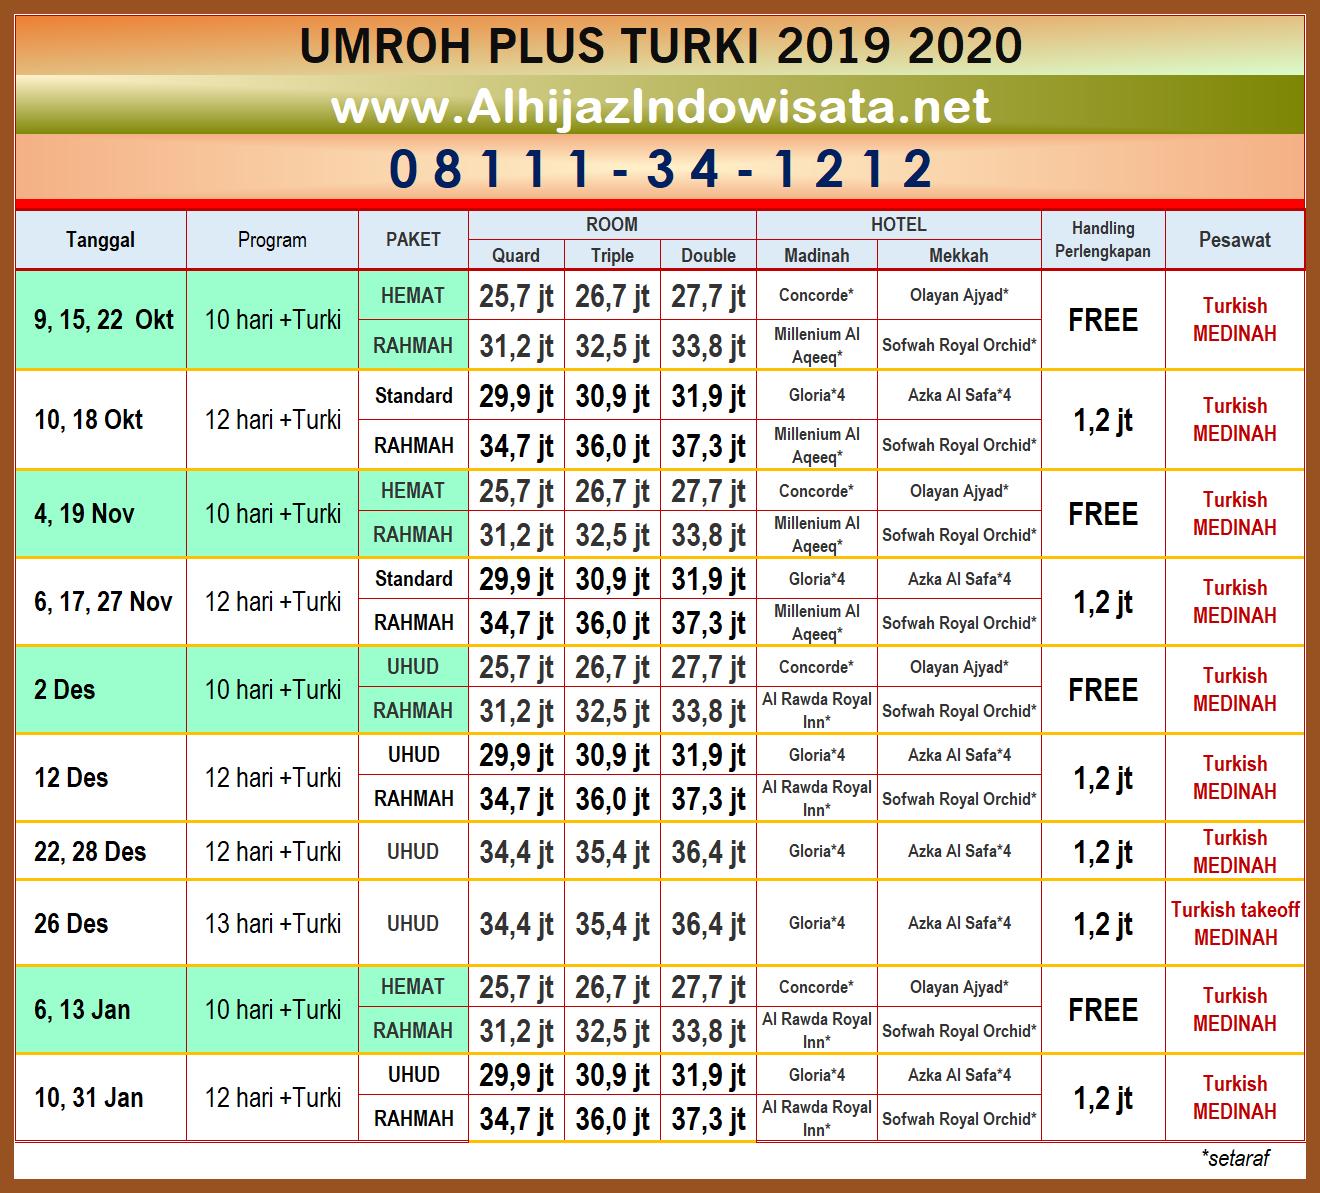 BIAYA UMROH PLUS TURKI 2019 2020